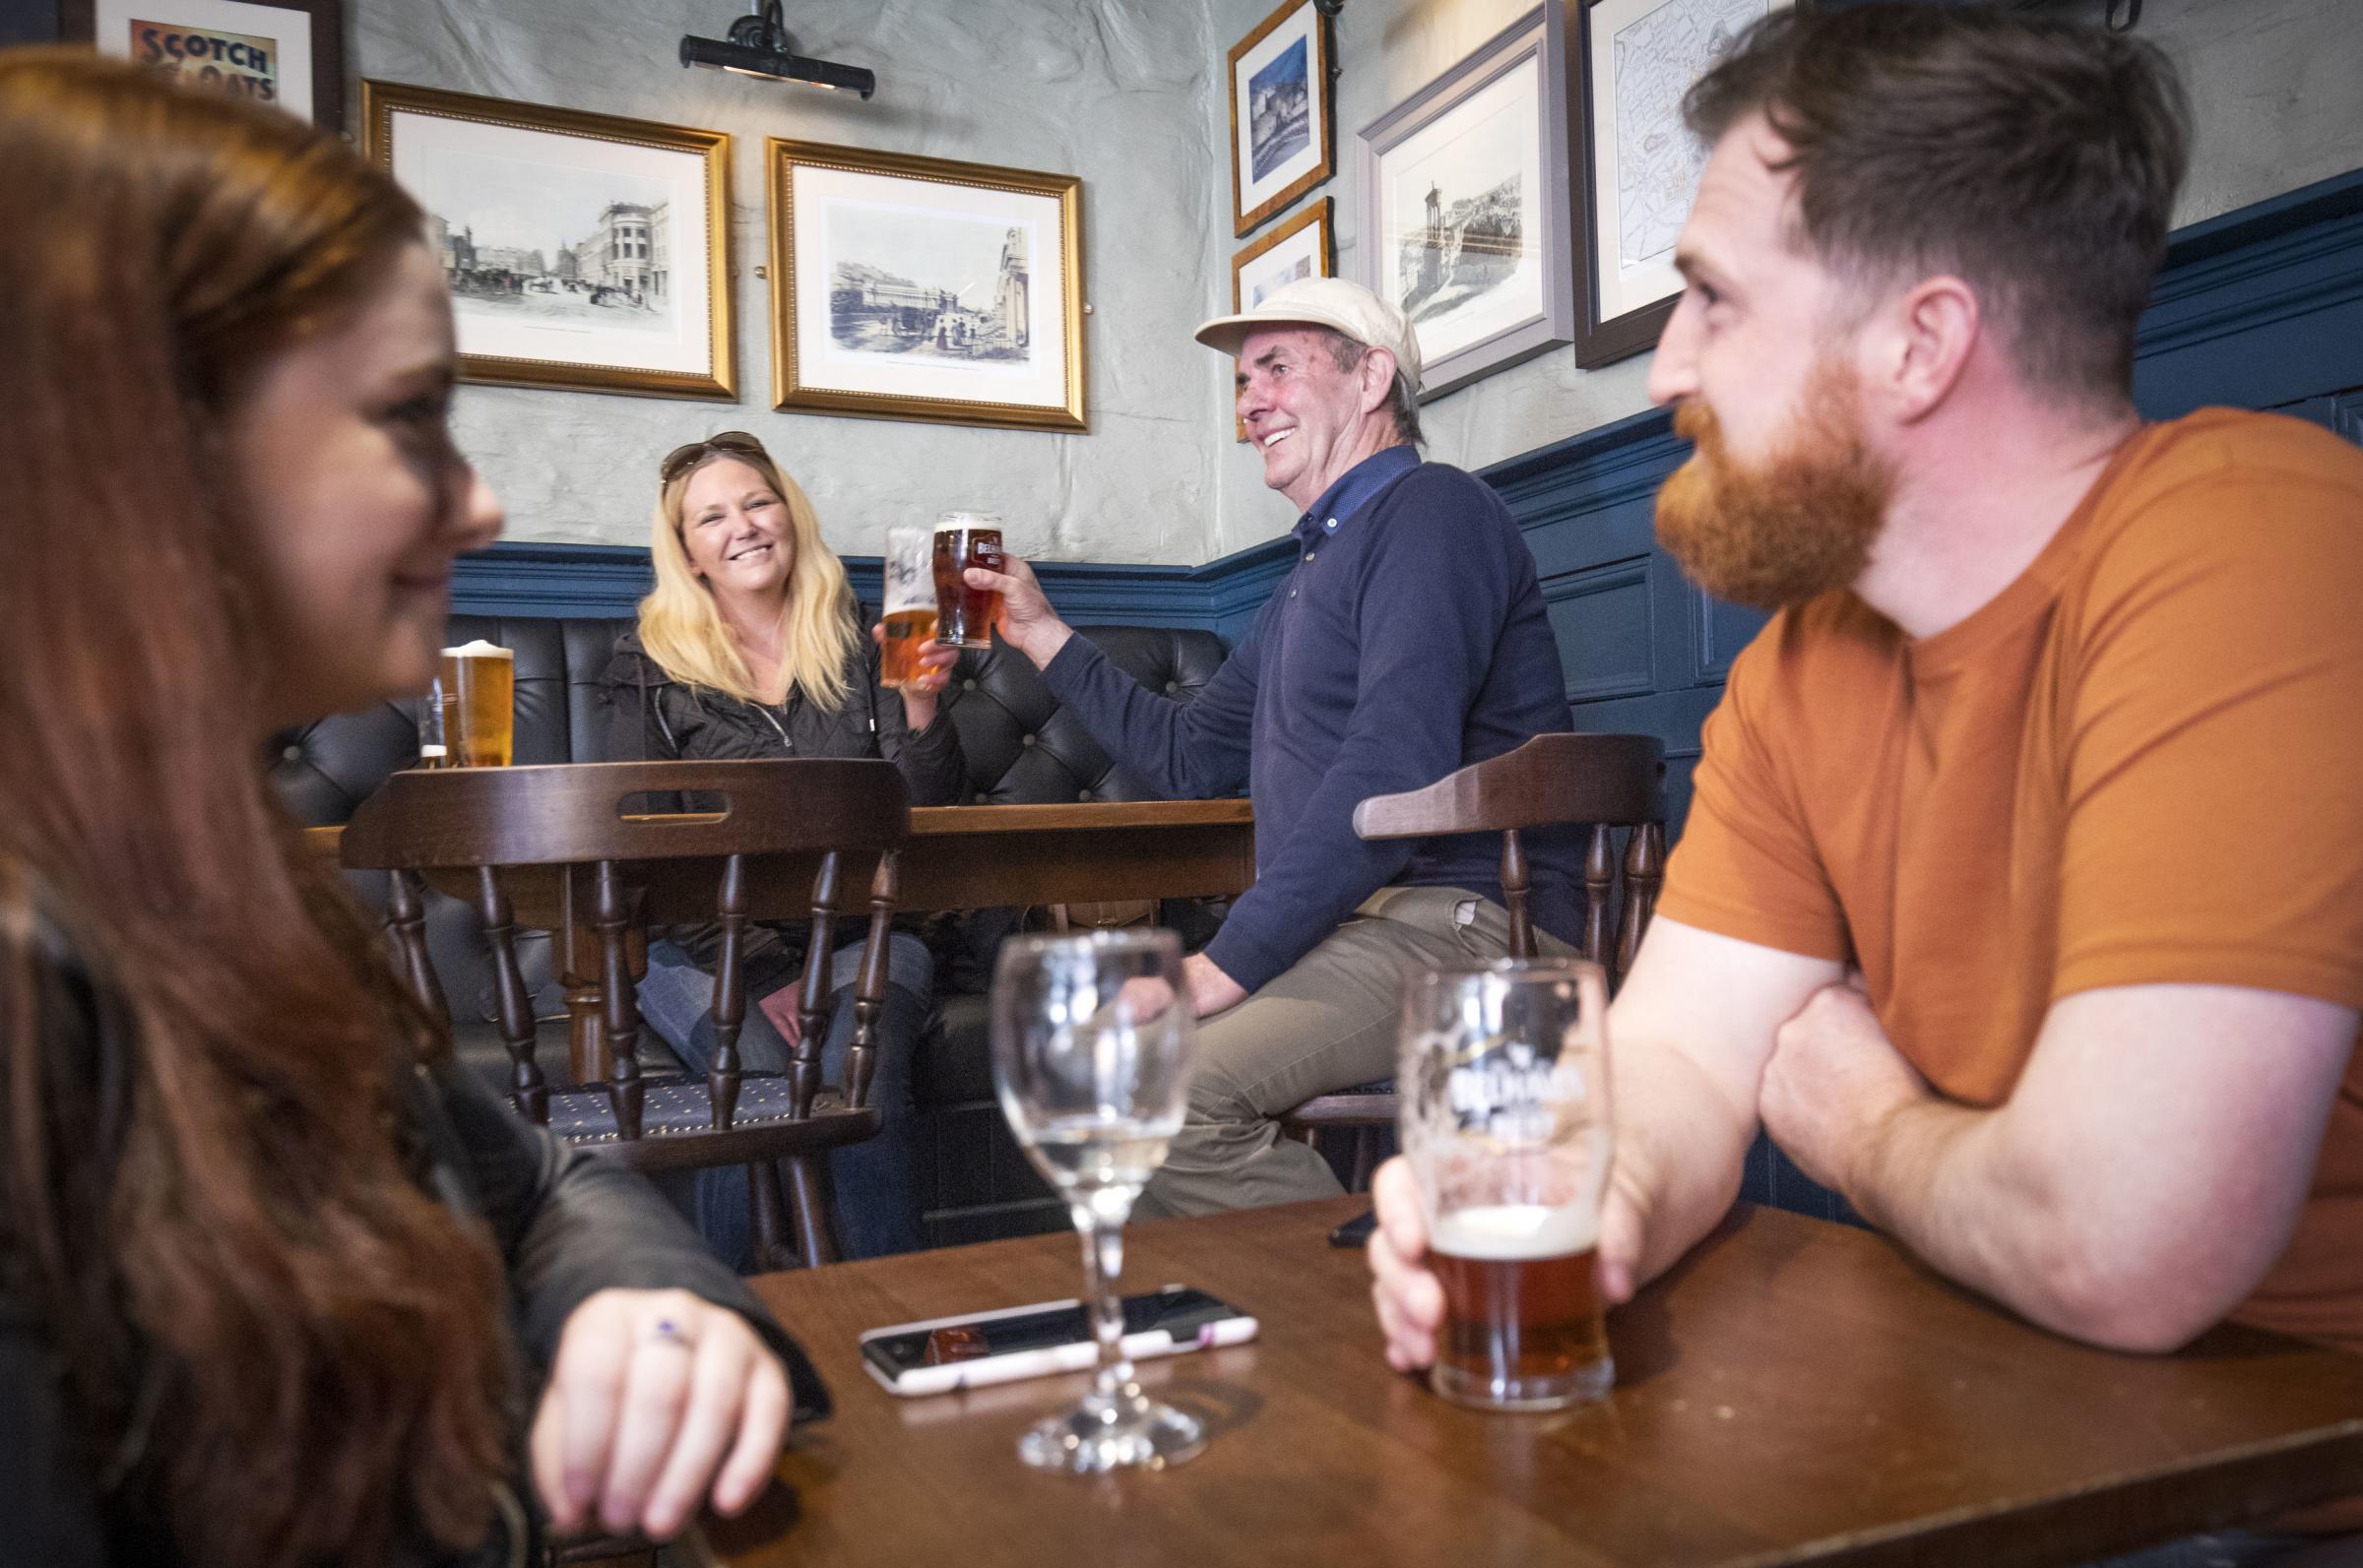 heraldscotland.com - Scott Wright - Scott Wright: Will Sunak have bottle to support key Scots industries in his latest Budget?